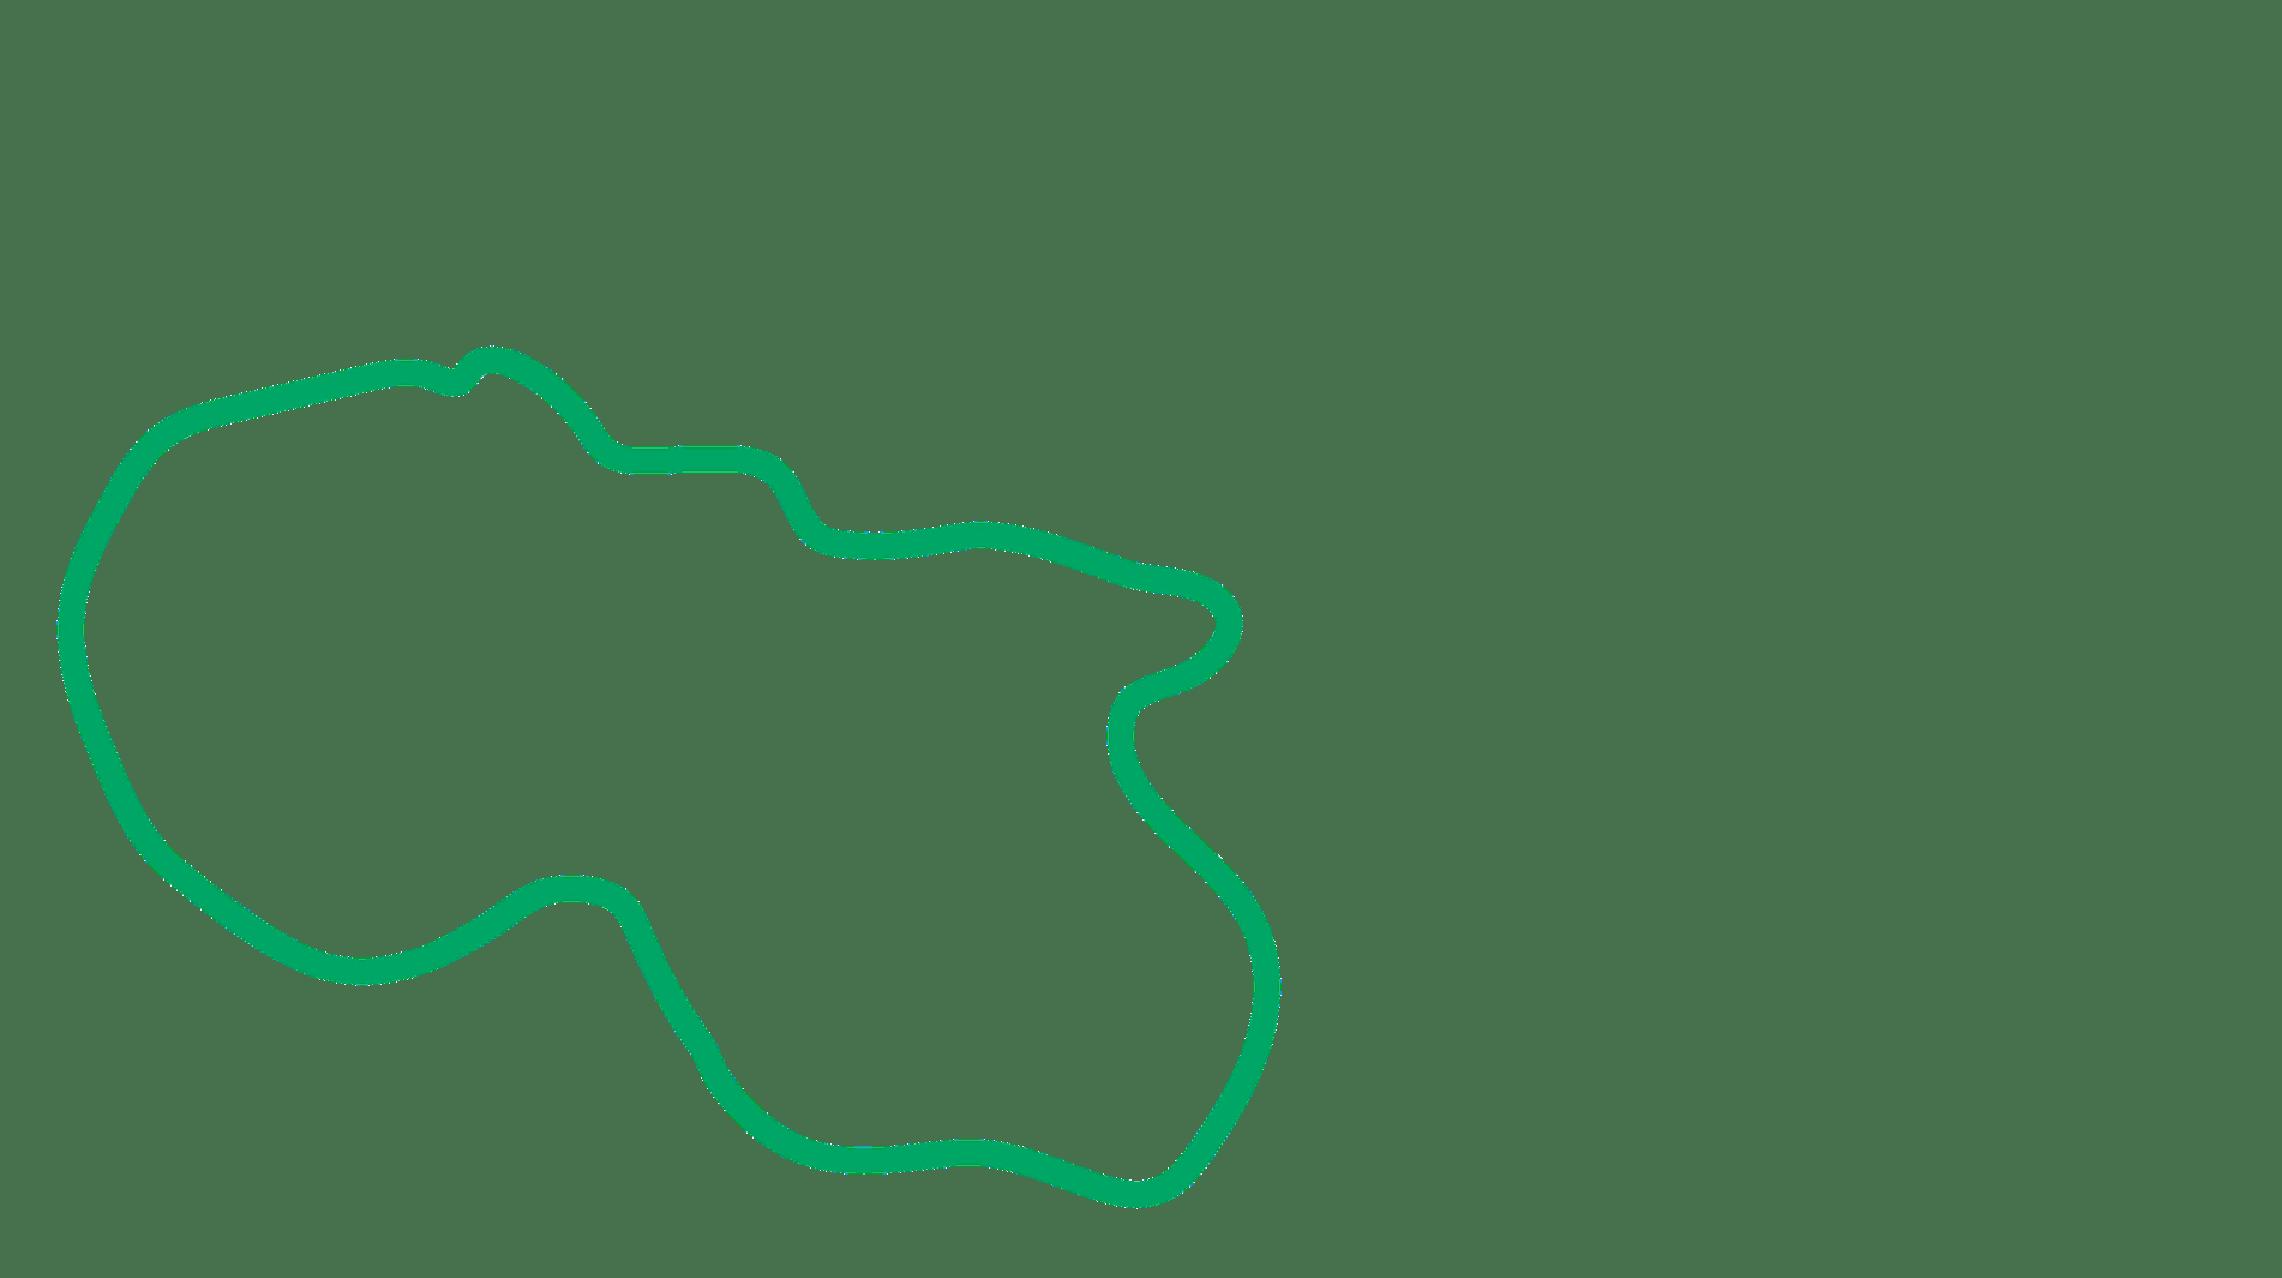 Territoire des Gwich'in